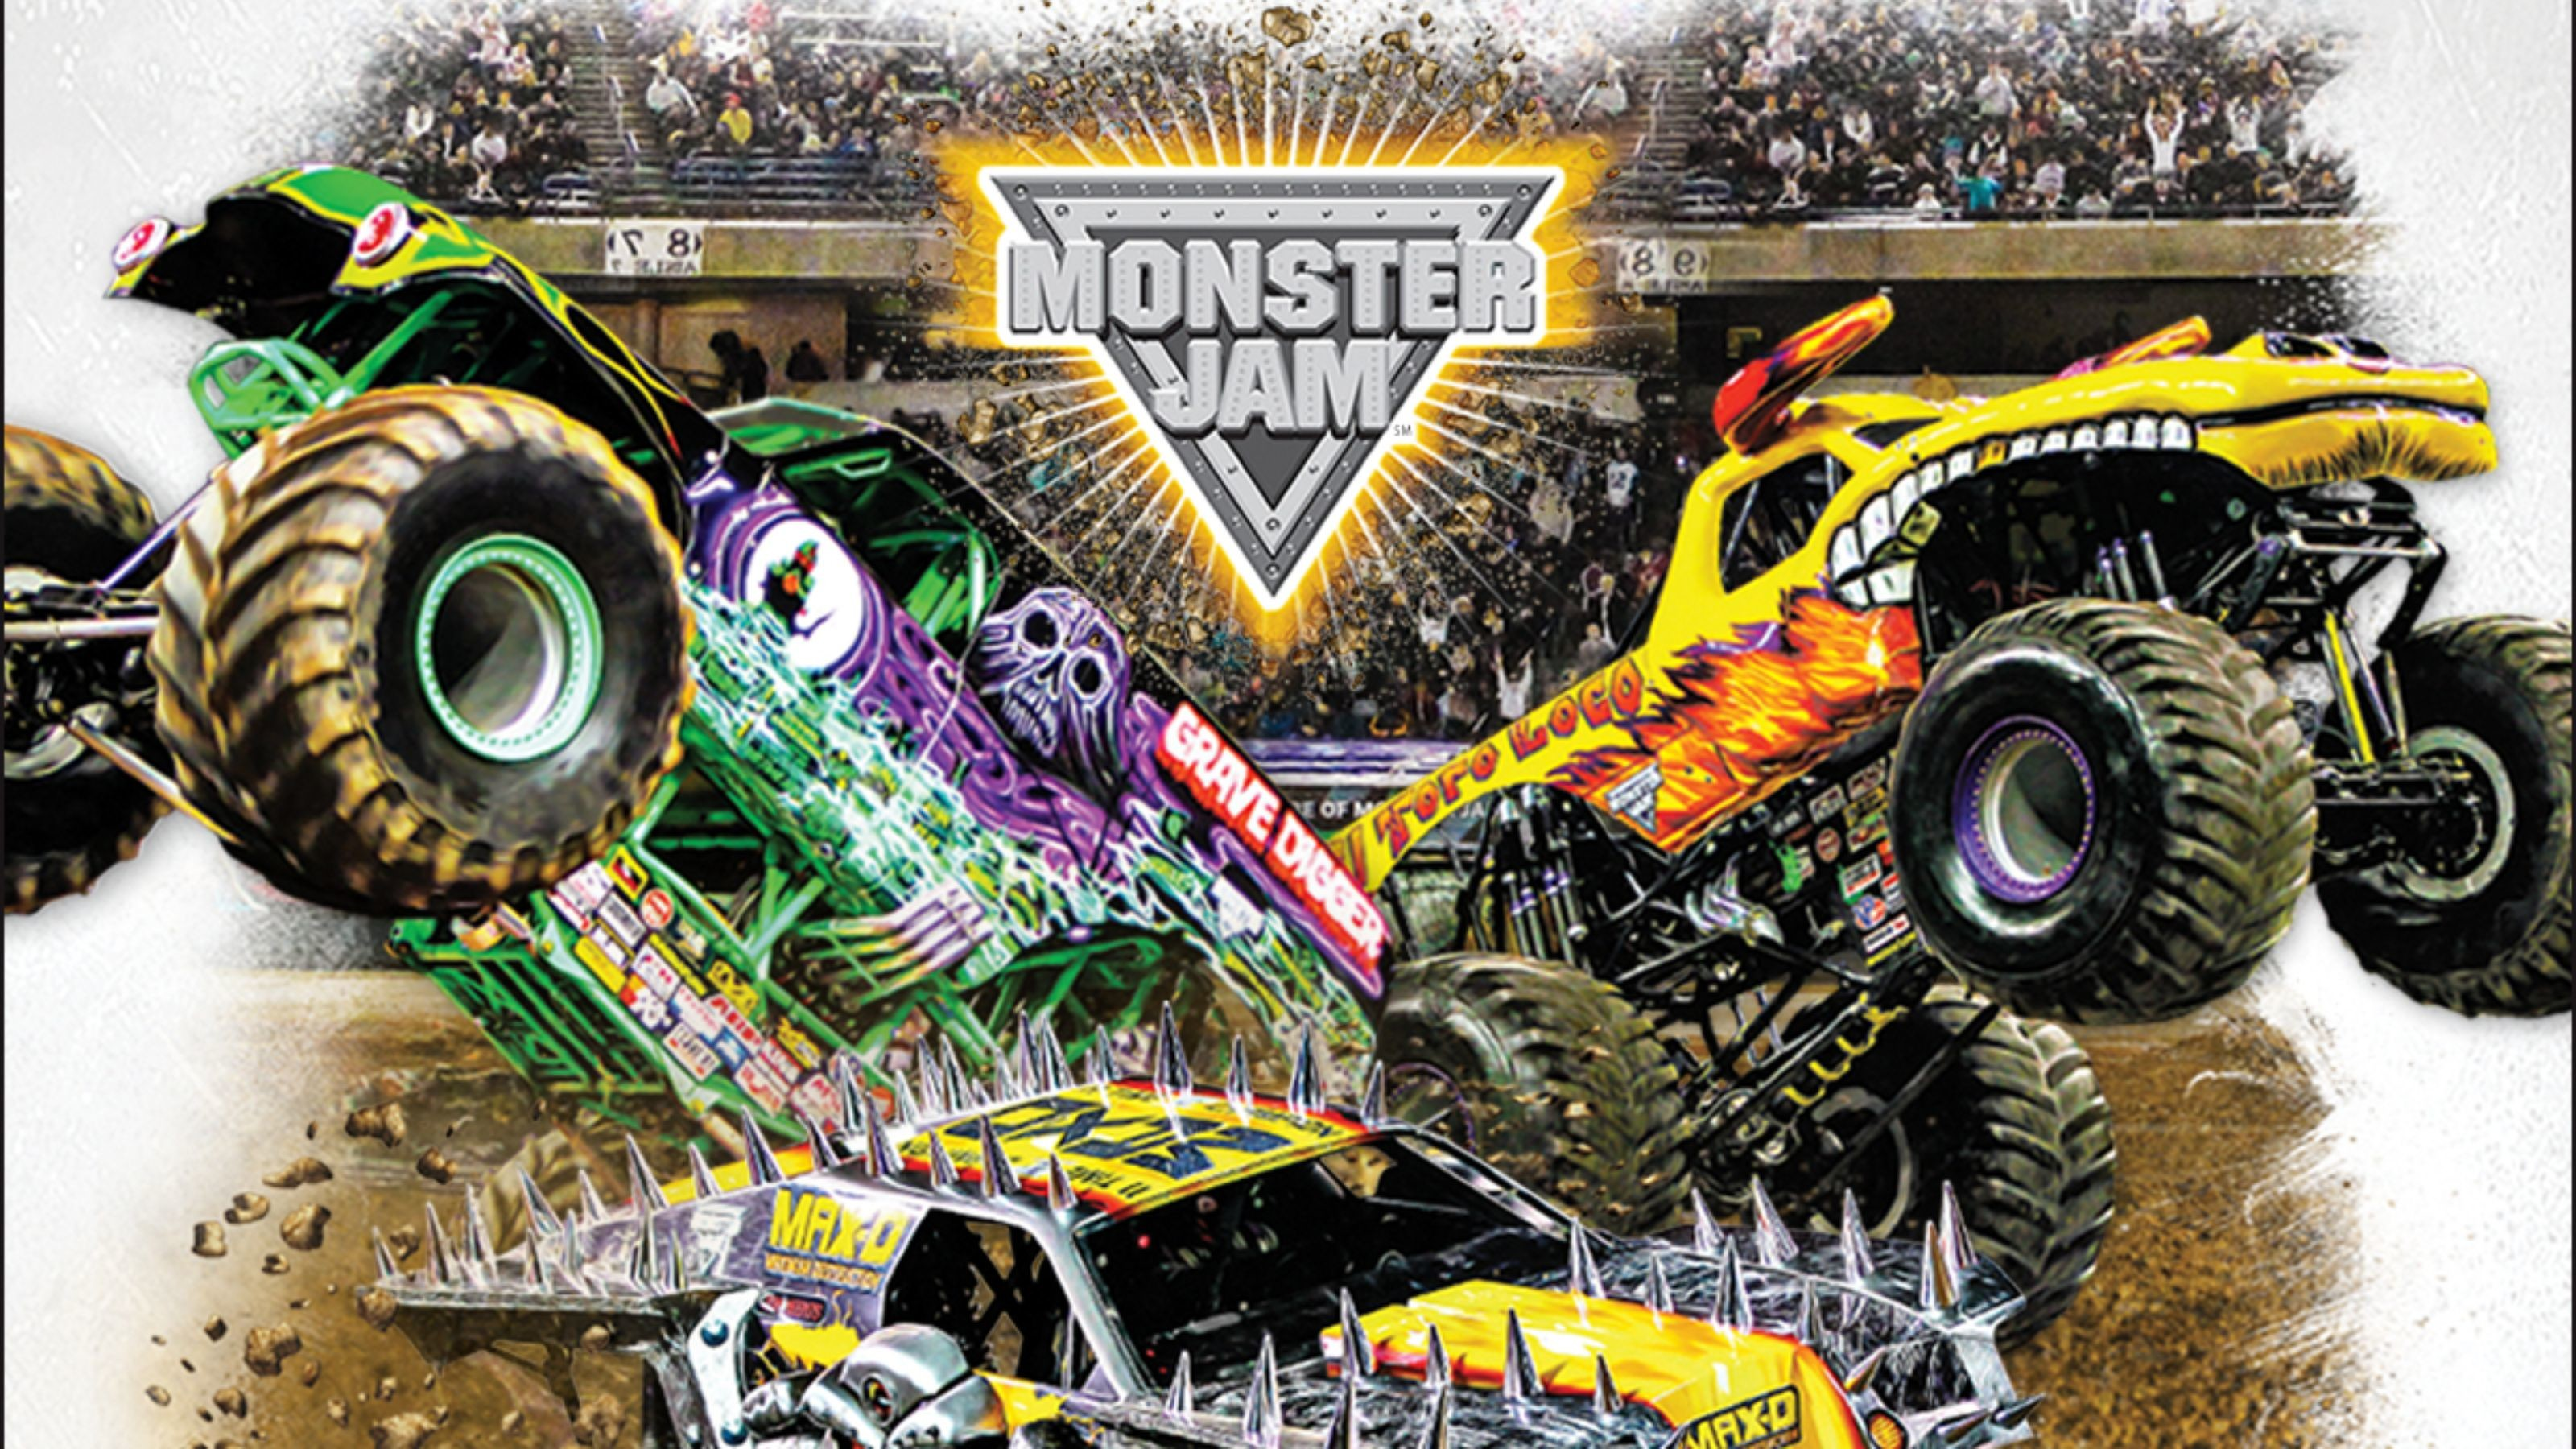 Monster Jam Wallpaper Desktop (51+ images)